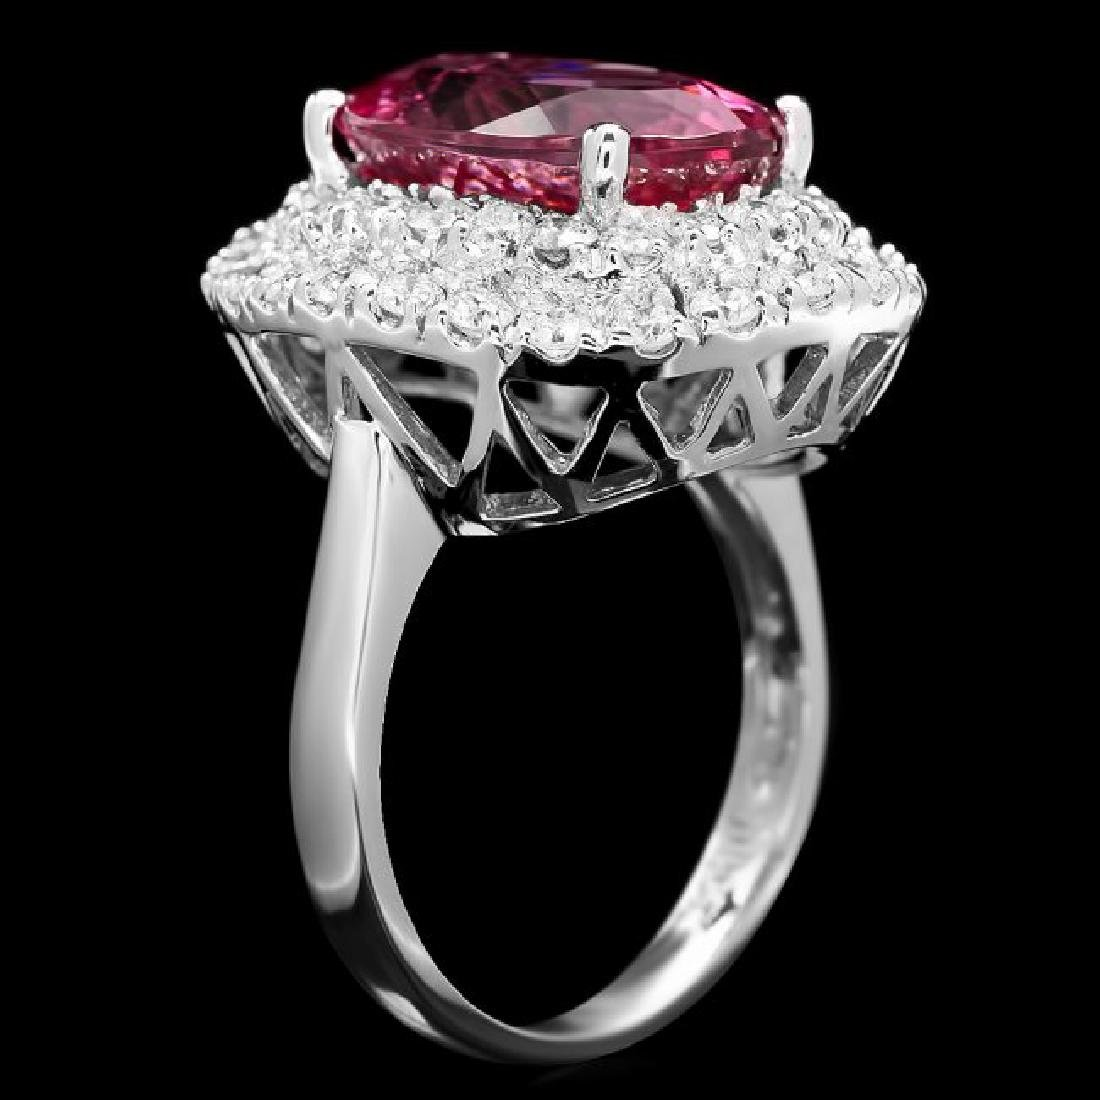 14k Gold 6.55ct Tourmaline 1.45ct Diamond Ring - 2